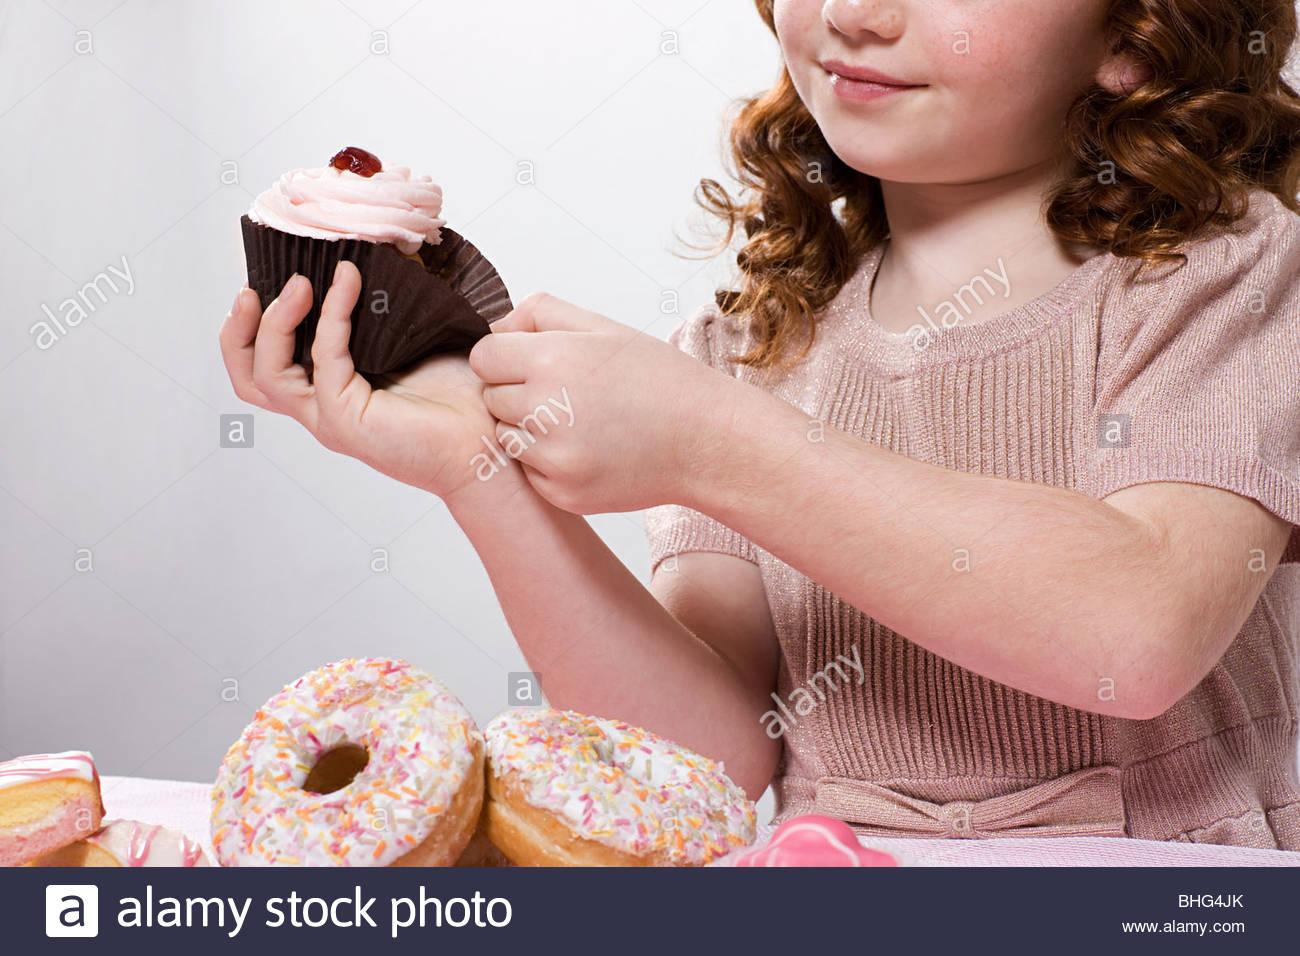 girl-with-cupcake-BHG4JK.jpg